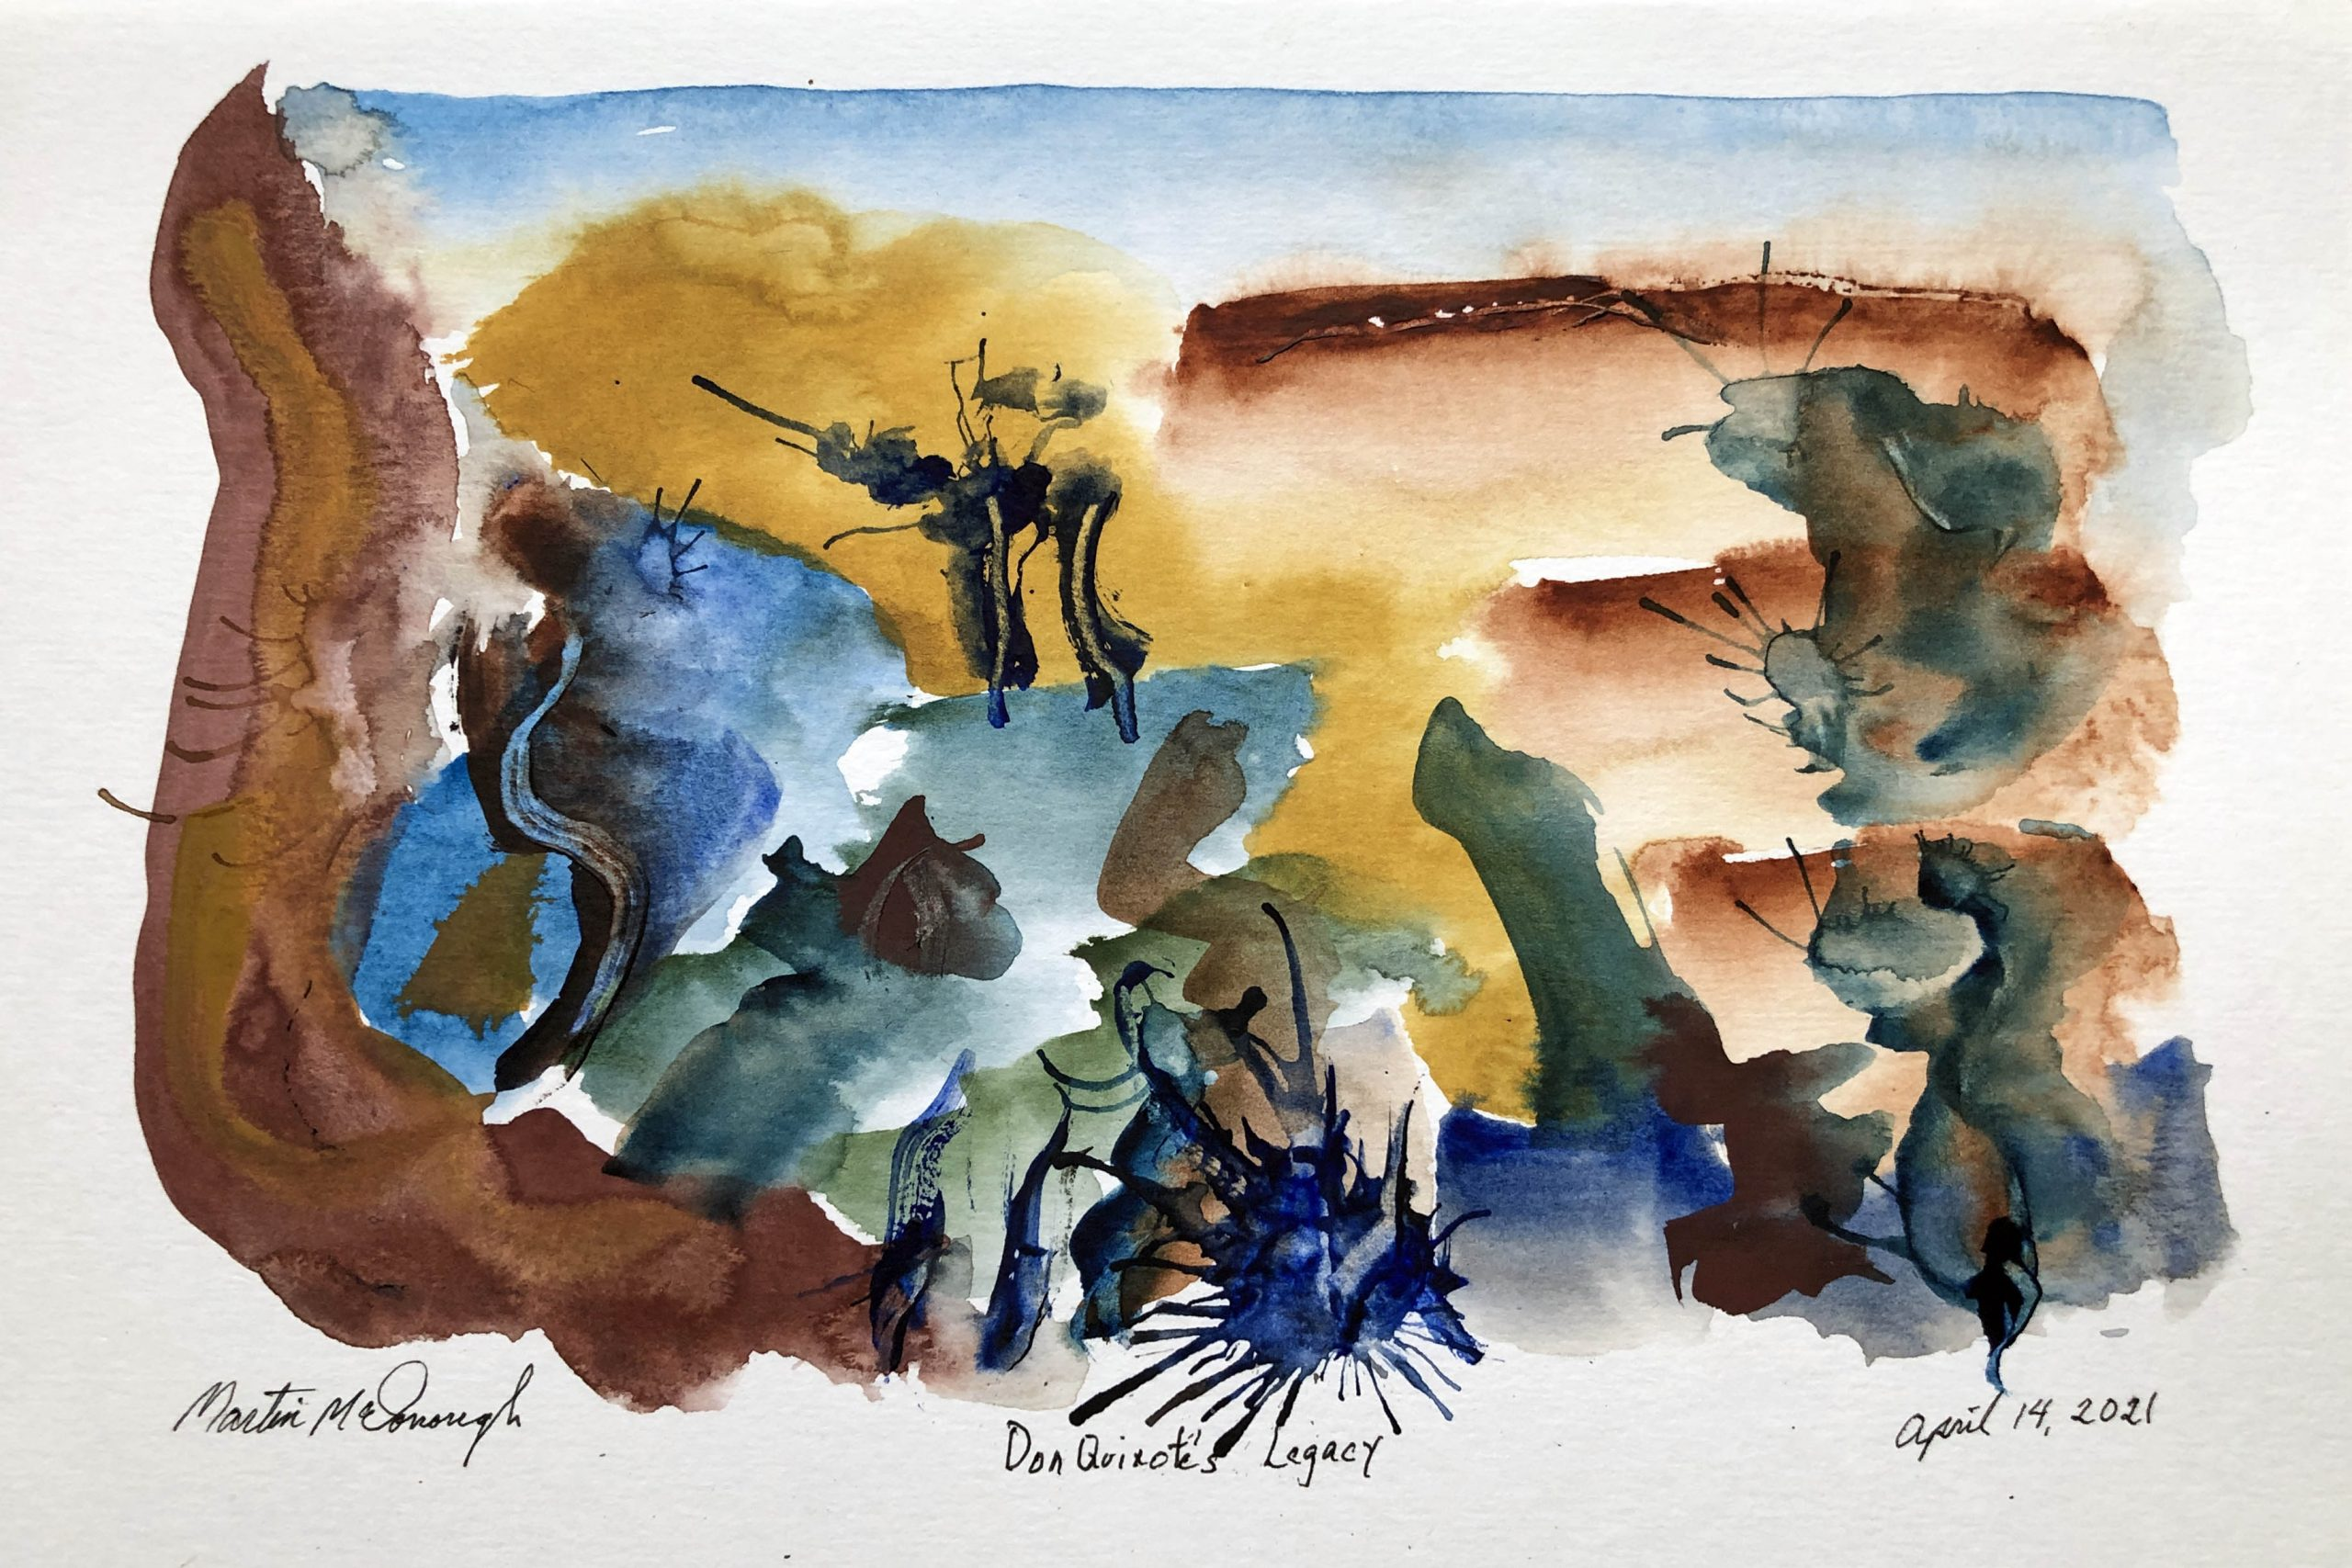 Don Quixote's Legacy web